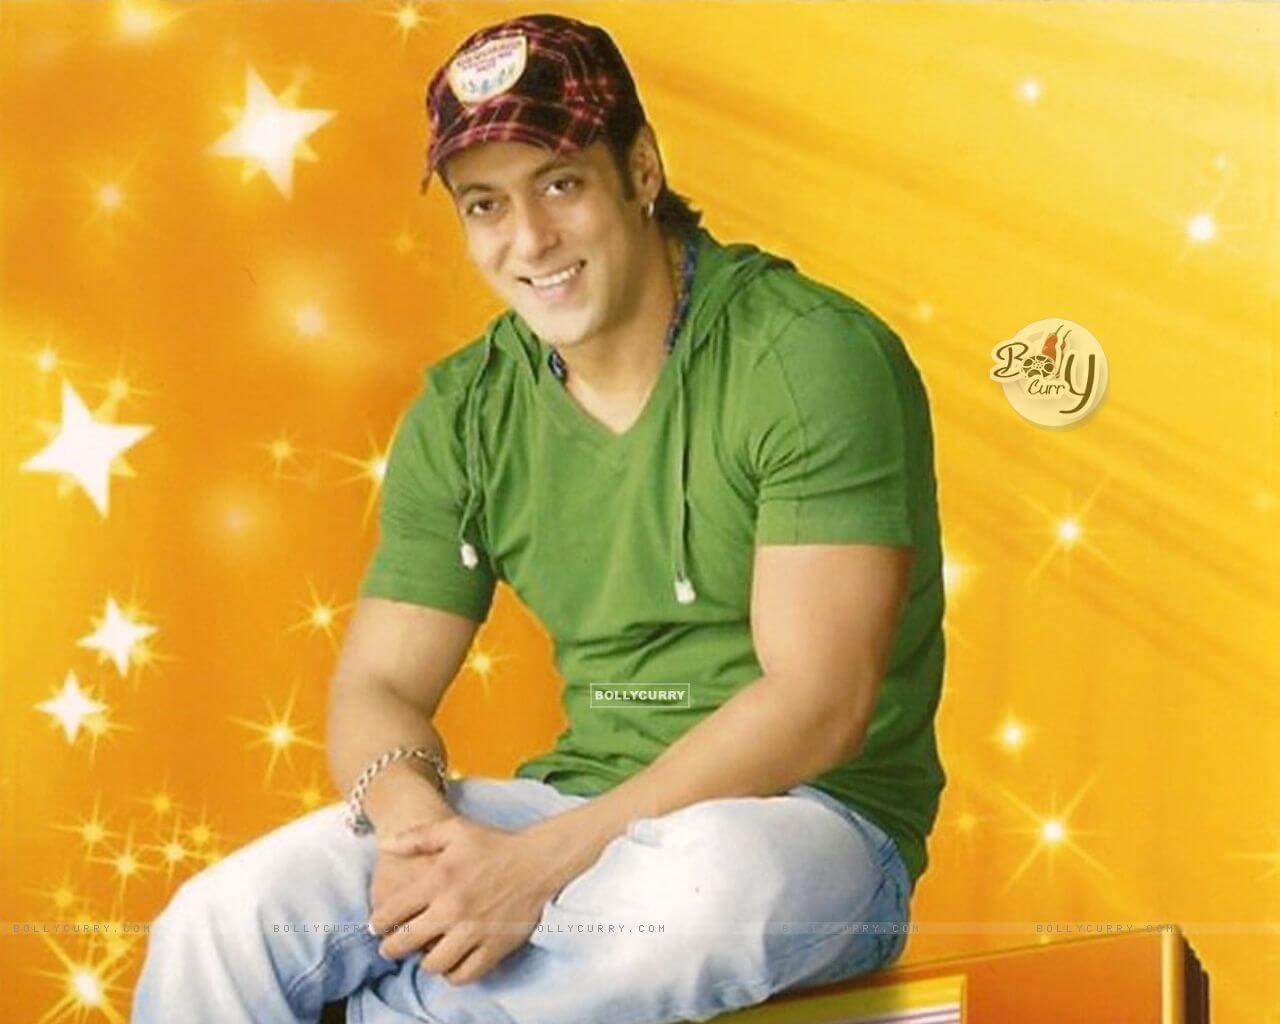 Salman Khan Photo, Age, News, Birthday, Height, Sister, Biography, Girlfriend, Awards, Address, Song, Video, Net Worth, Education, Twitter, Instagram, Facebook, Wiki, Imdb, Website, Youtube (63)